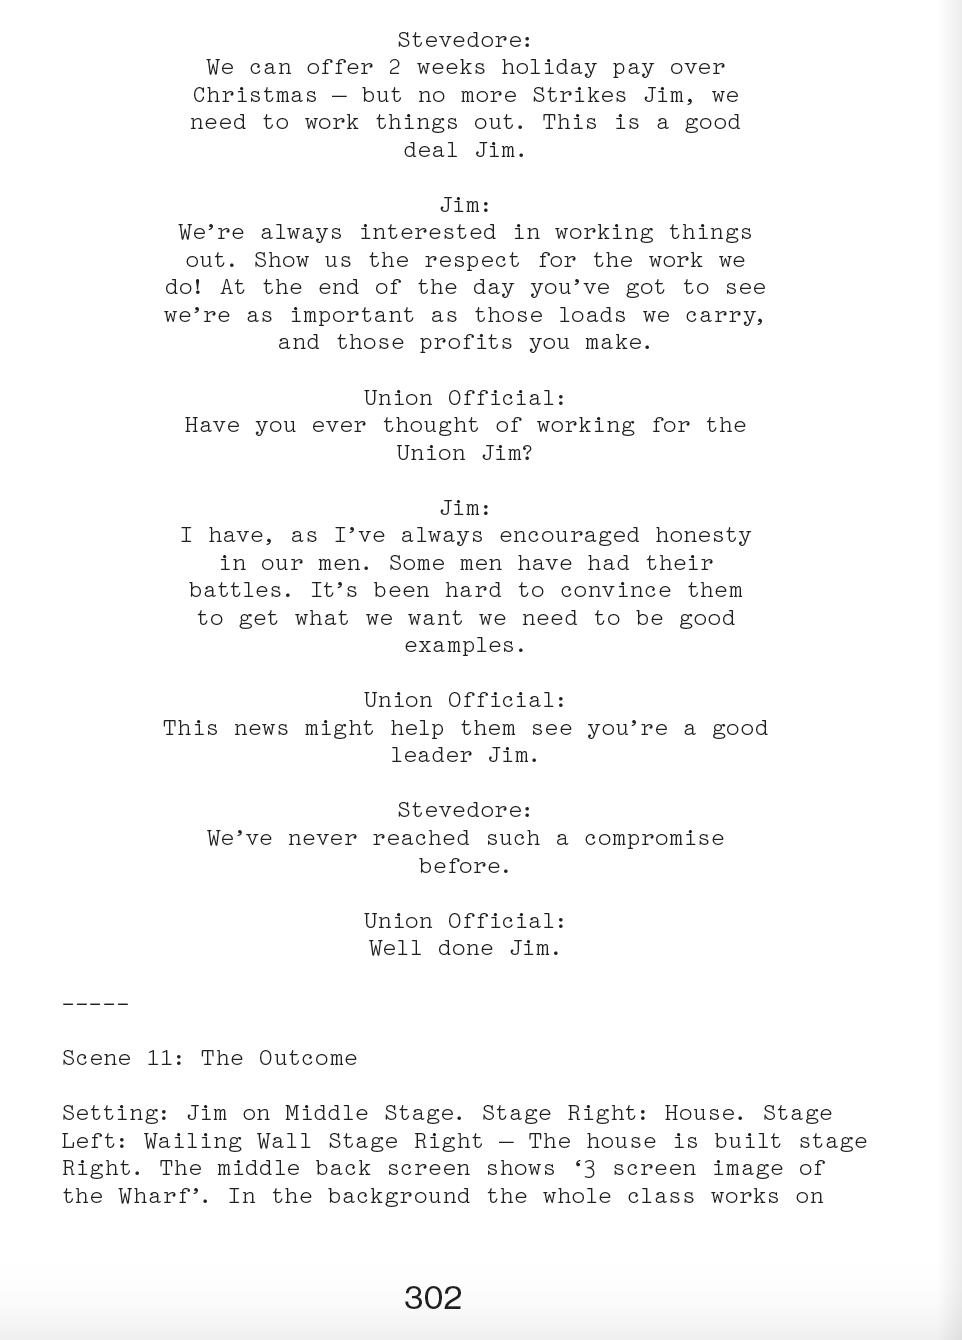 Script Book 21.png